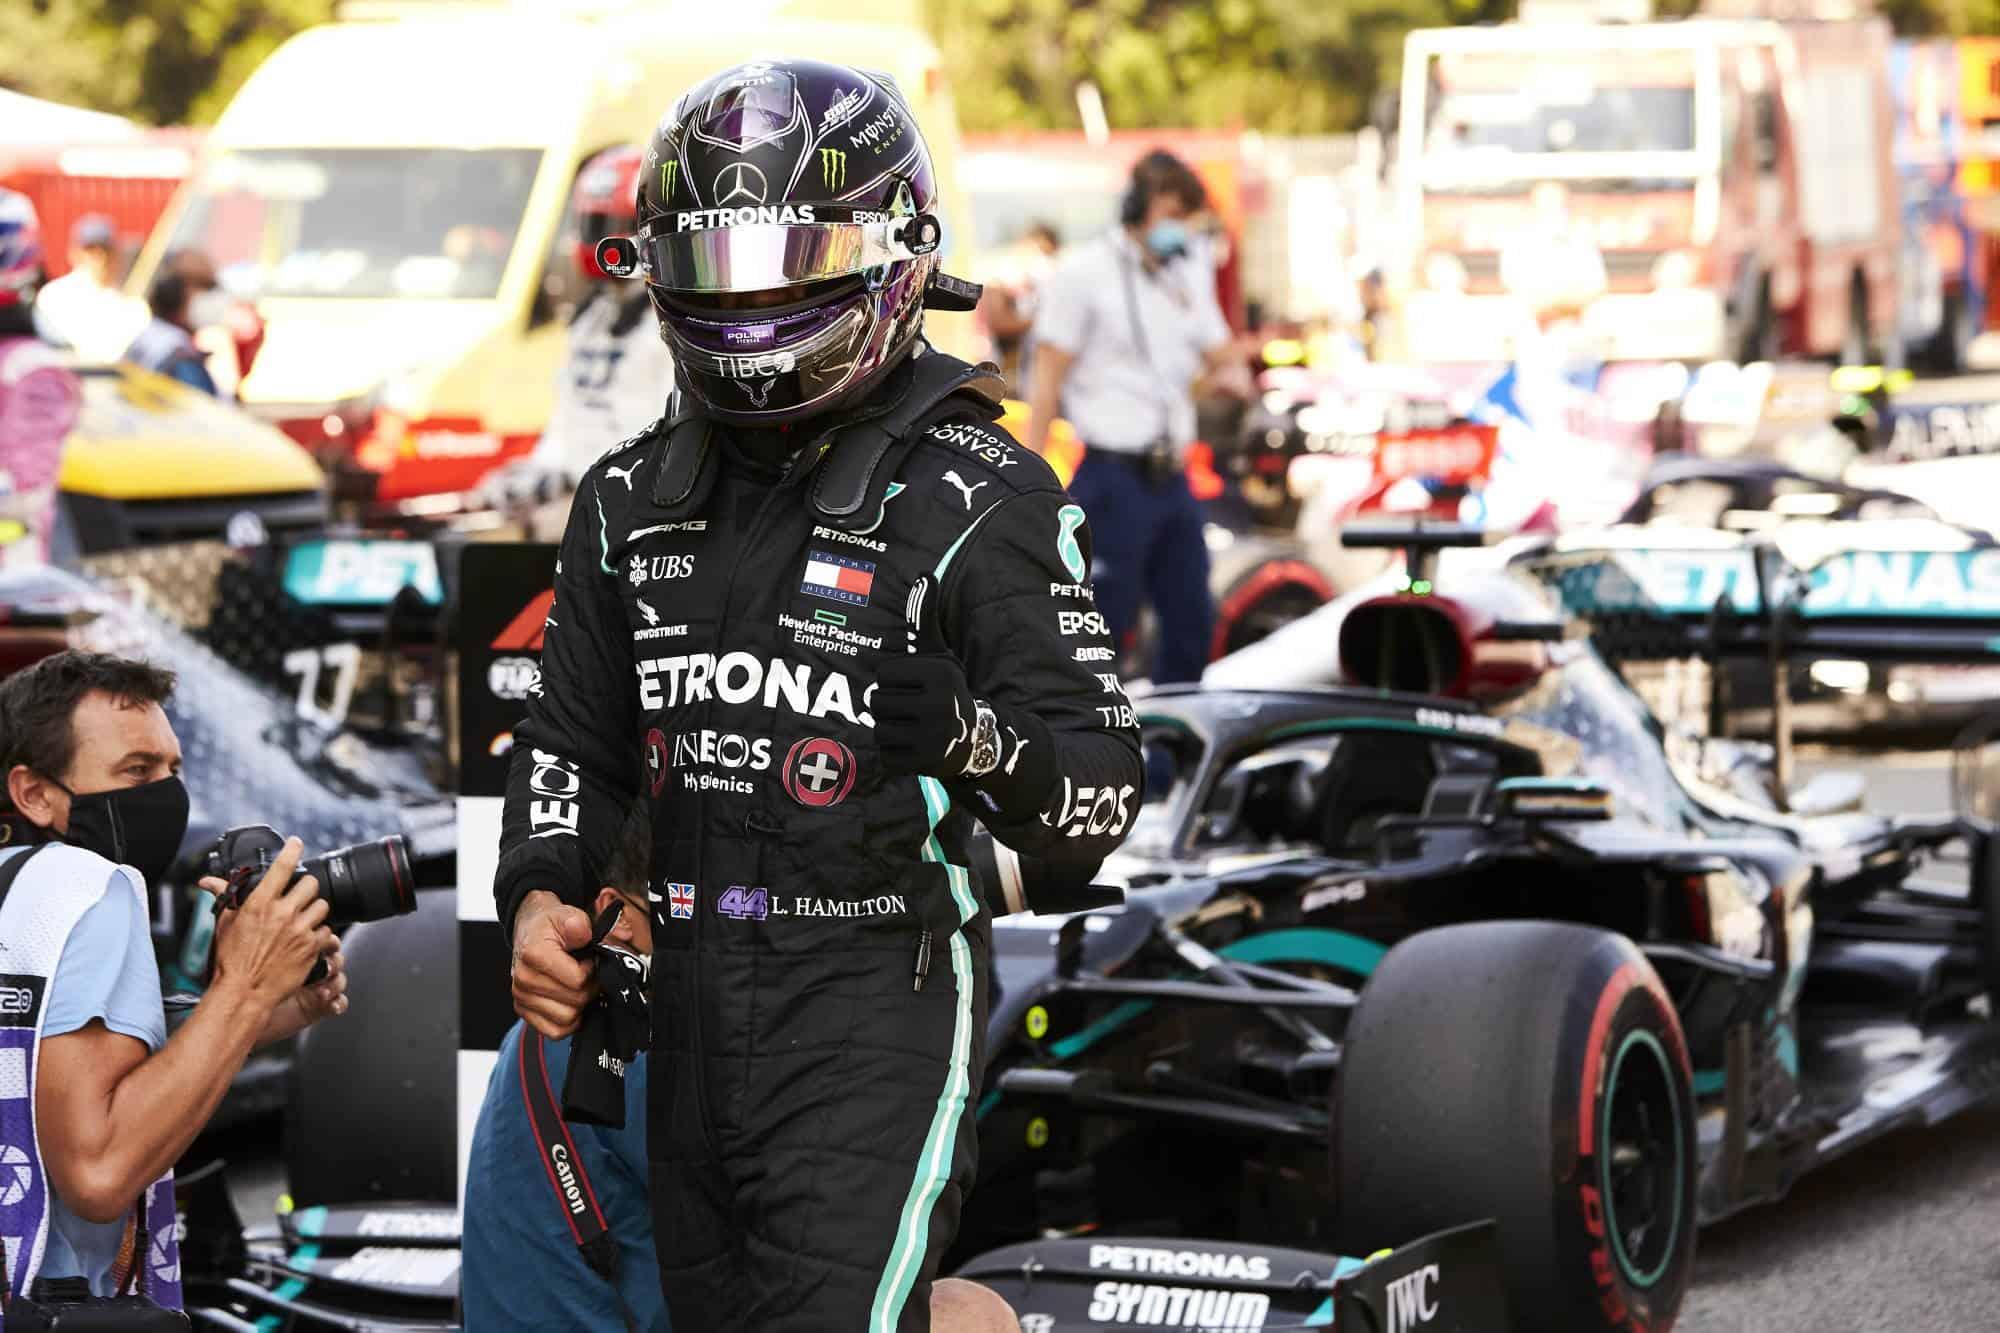 2020 Spanish GP Hamilton soft Pirelli parc ferme after qualifying Photo Daimler